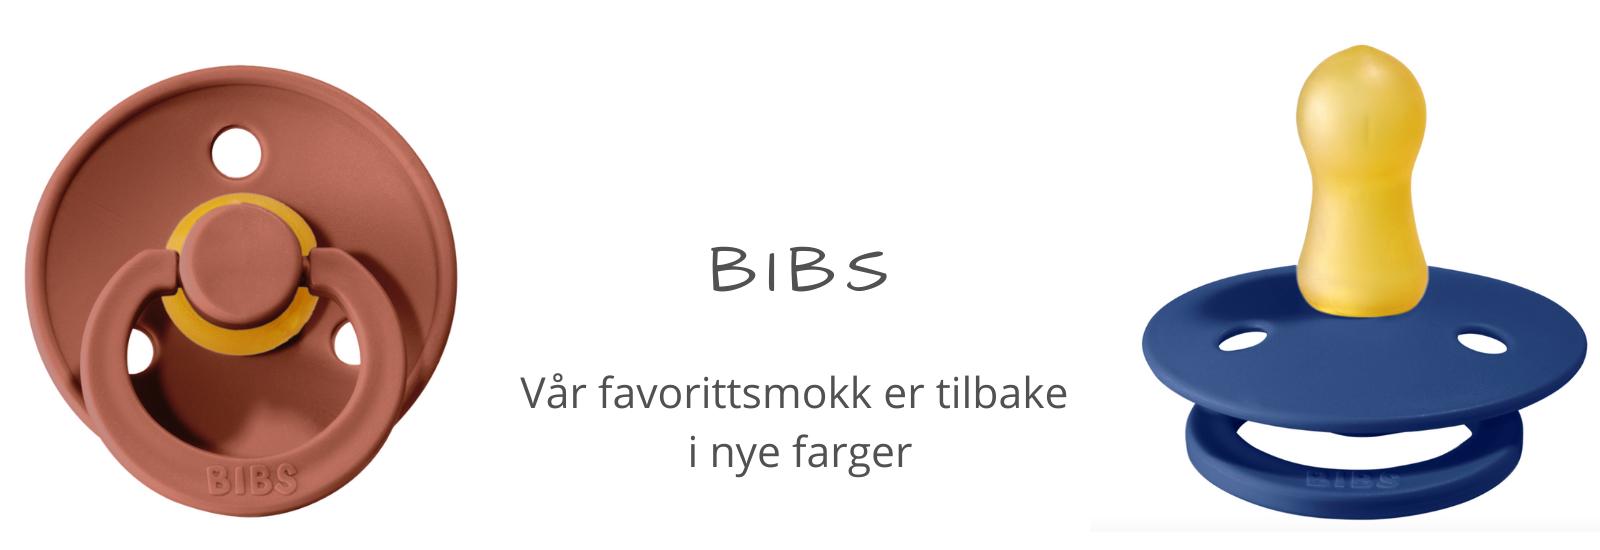 Bibs, smokk, naturlig smokk